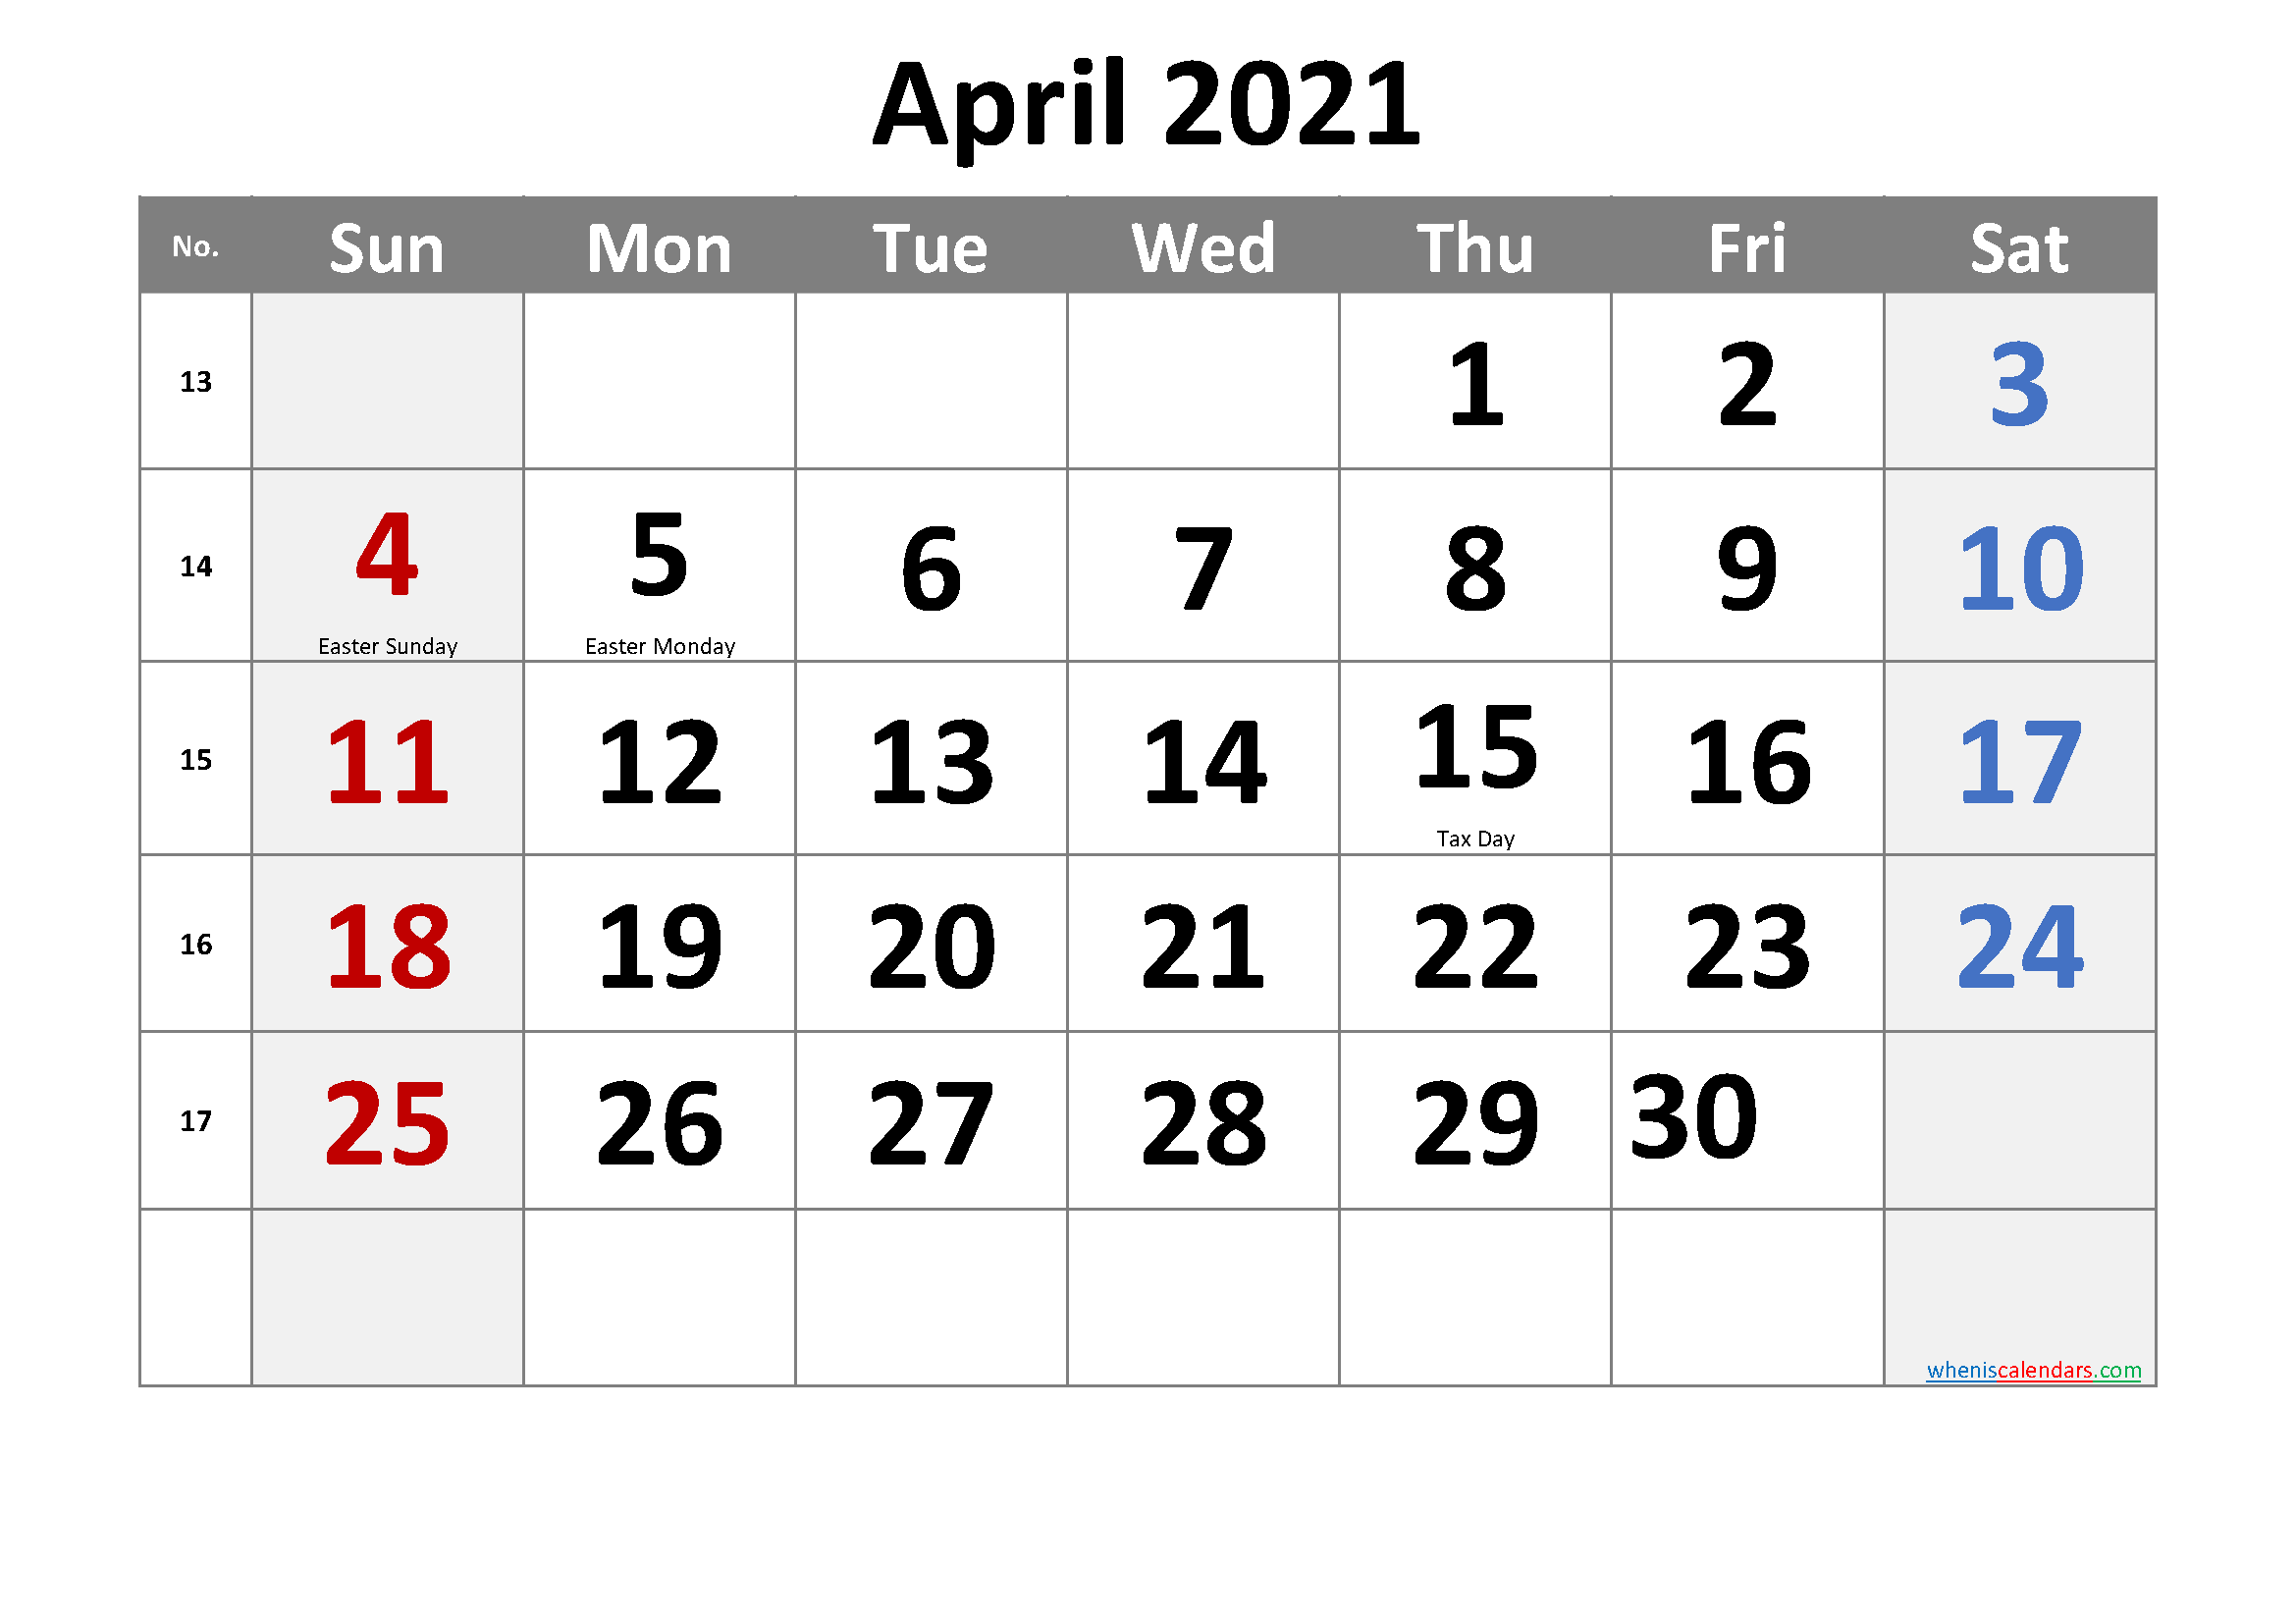 April 2021 Calendar Pdf | Lunar Calendar